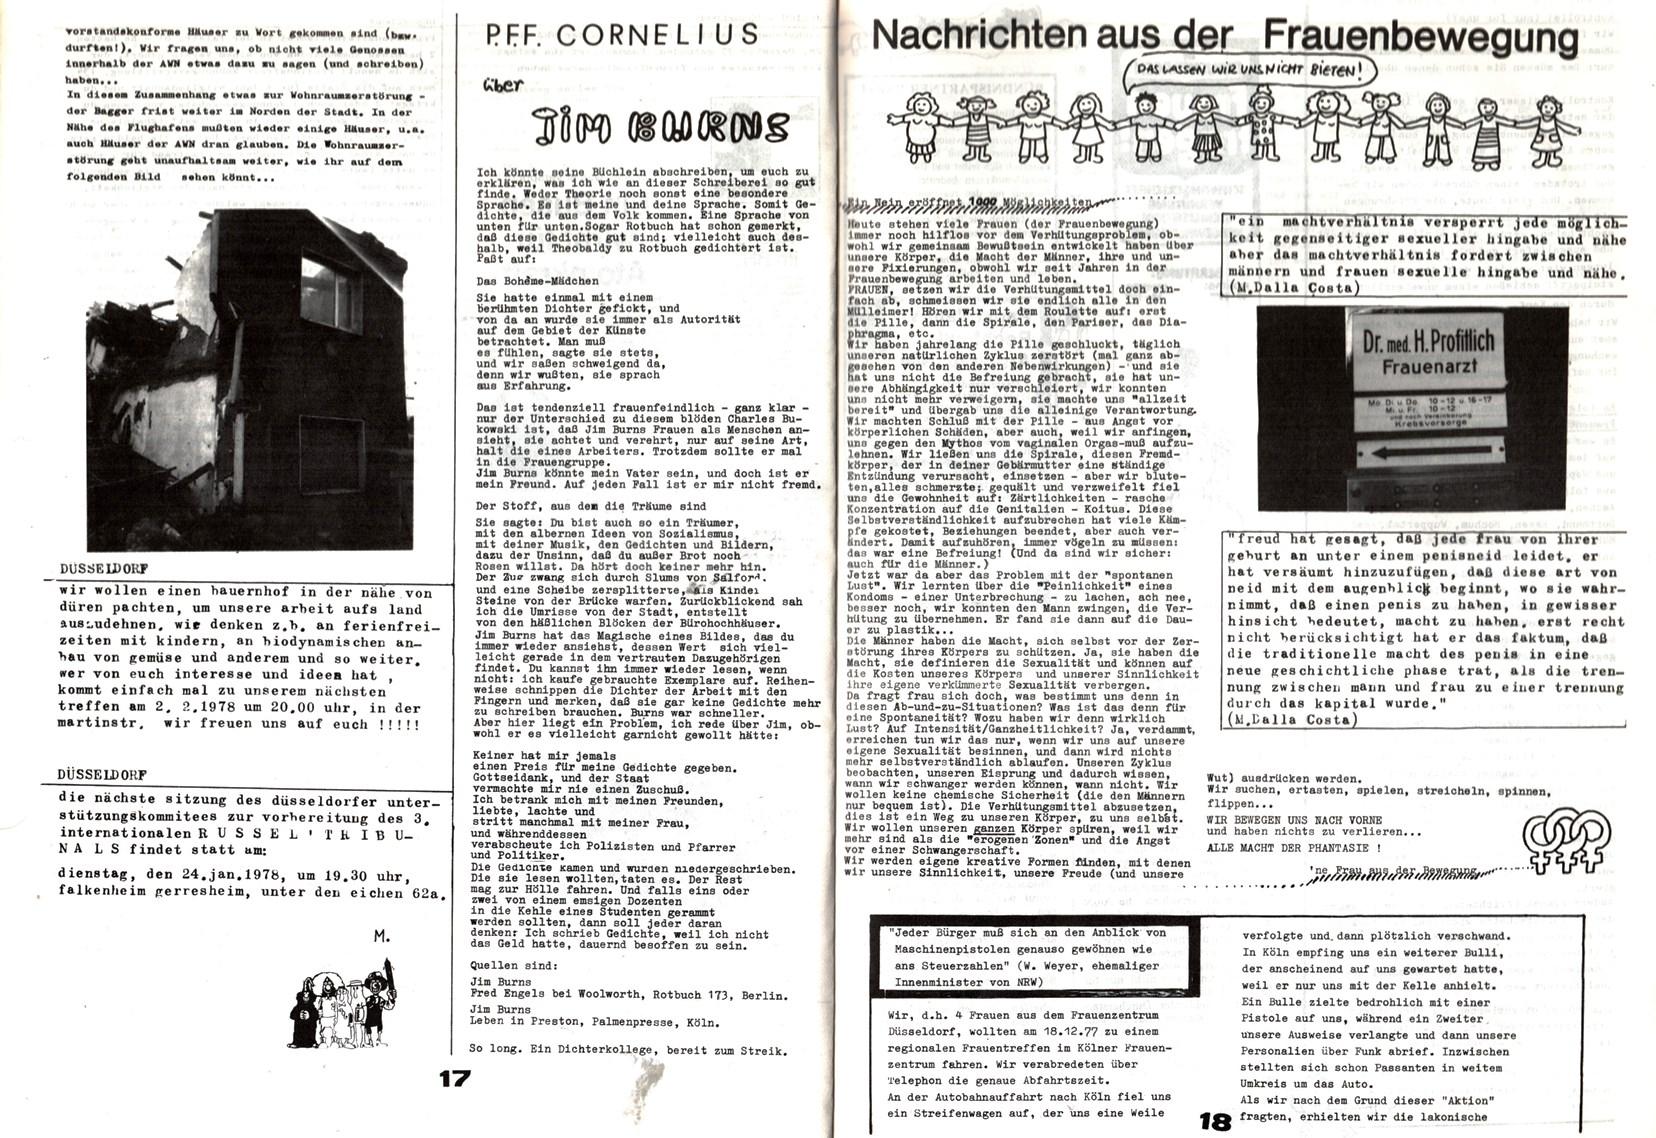 Duesseldorf_Gegenwind_19780200_010